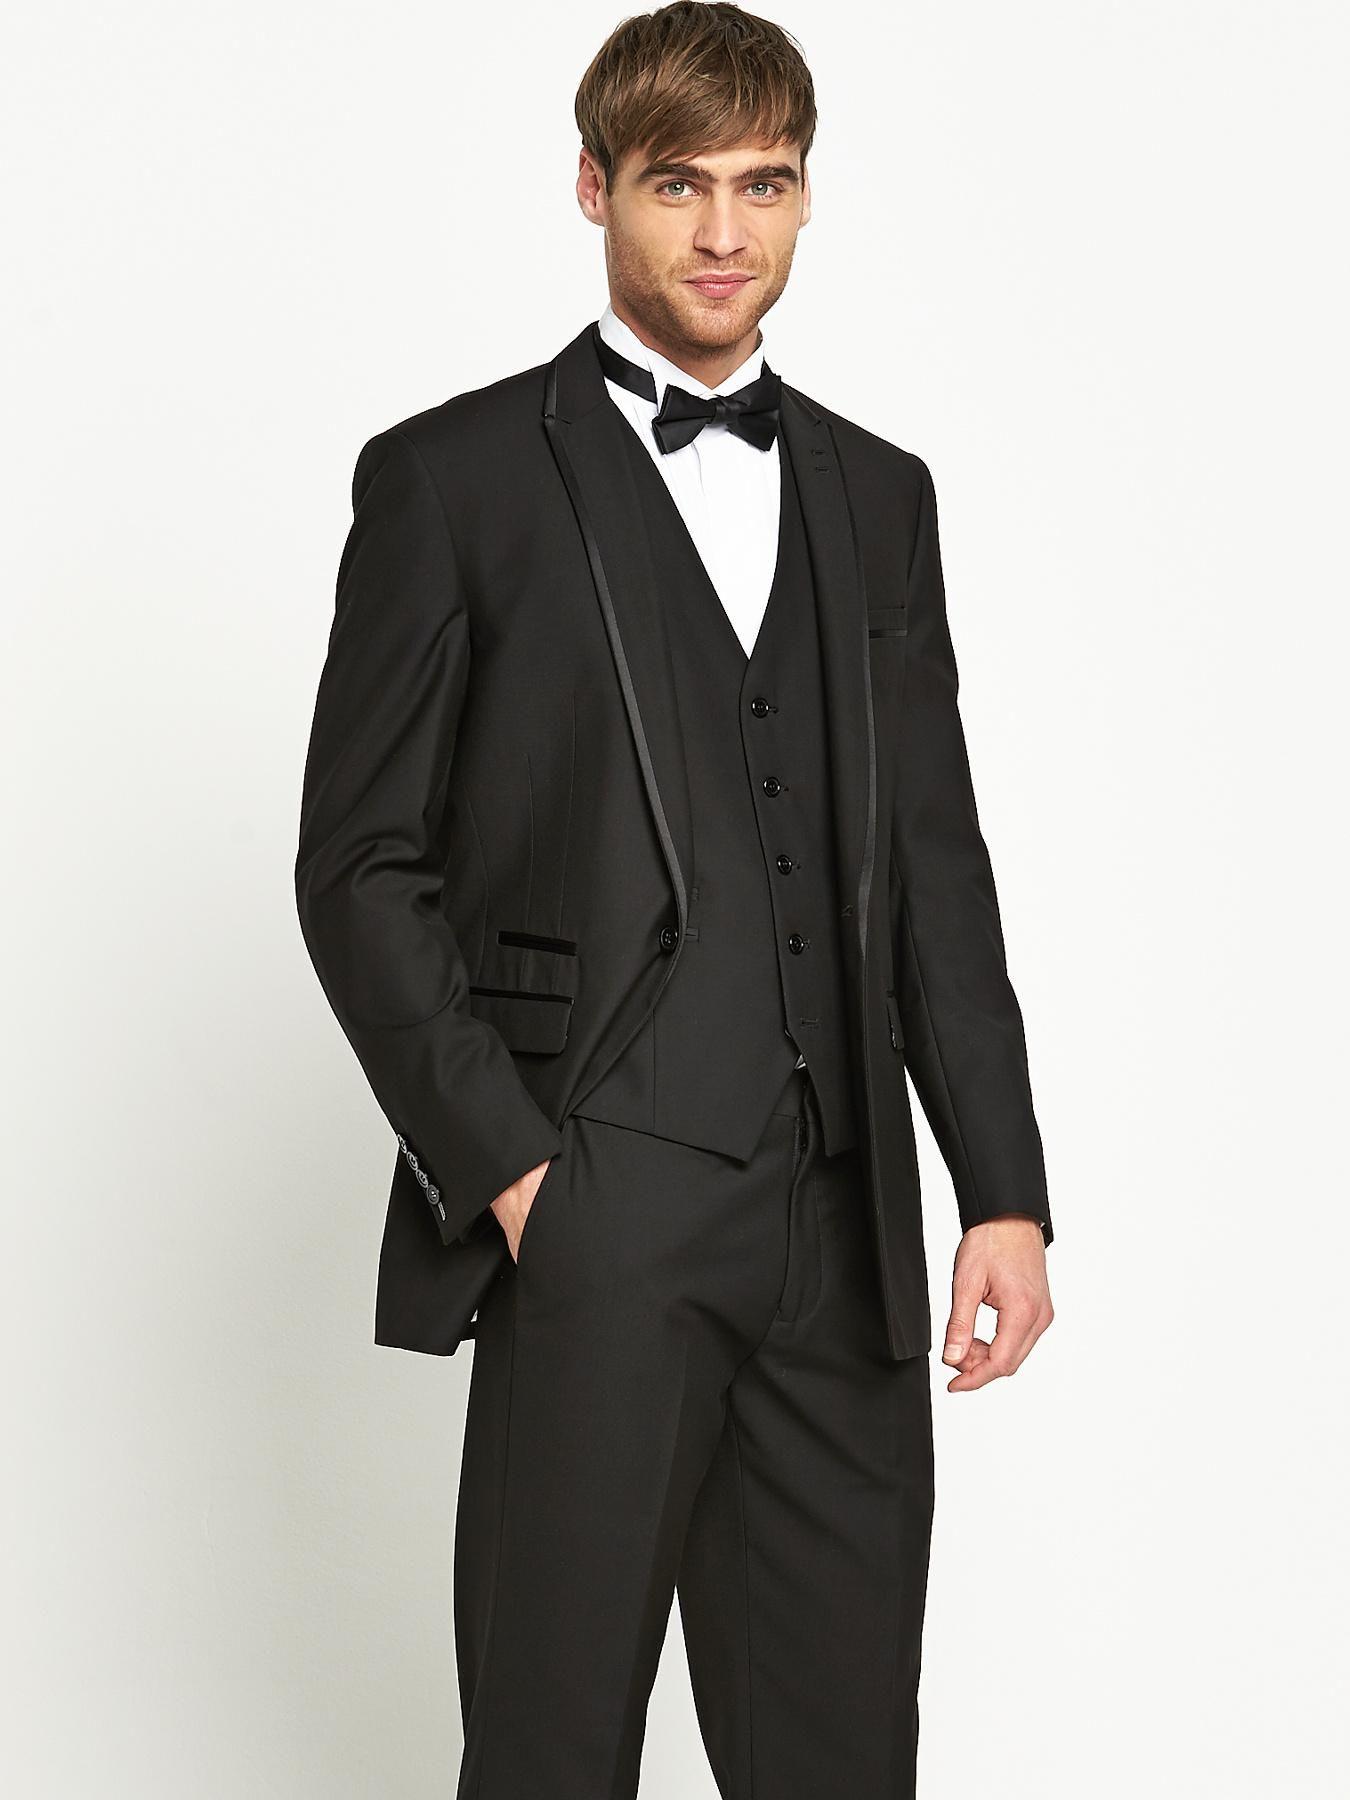 Littlewoods dresses for weddings  Skopes Mens Ronson Slim Fit Dinner Jacket  littlewoods  The